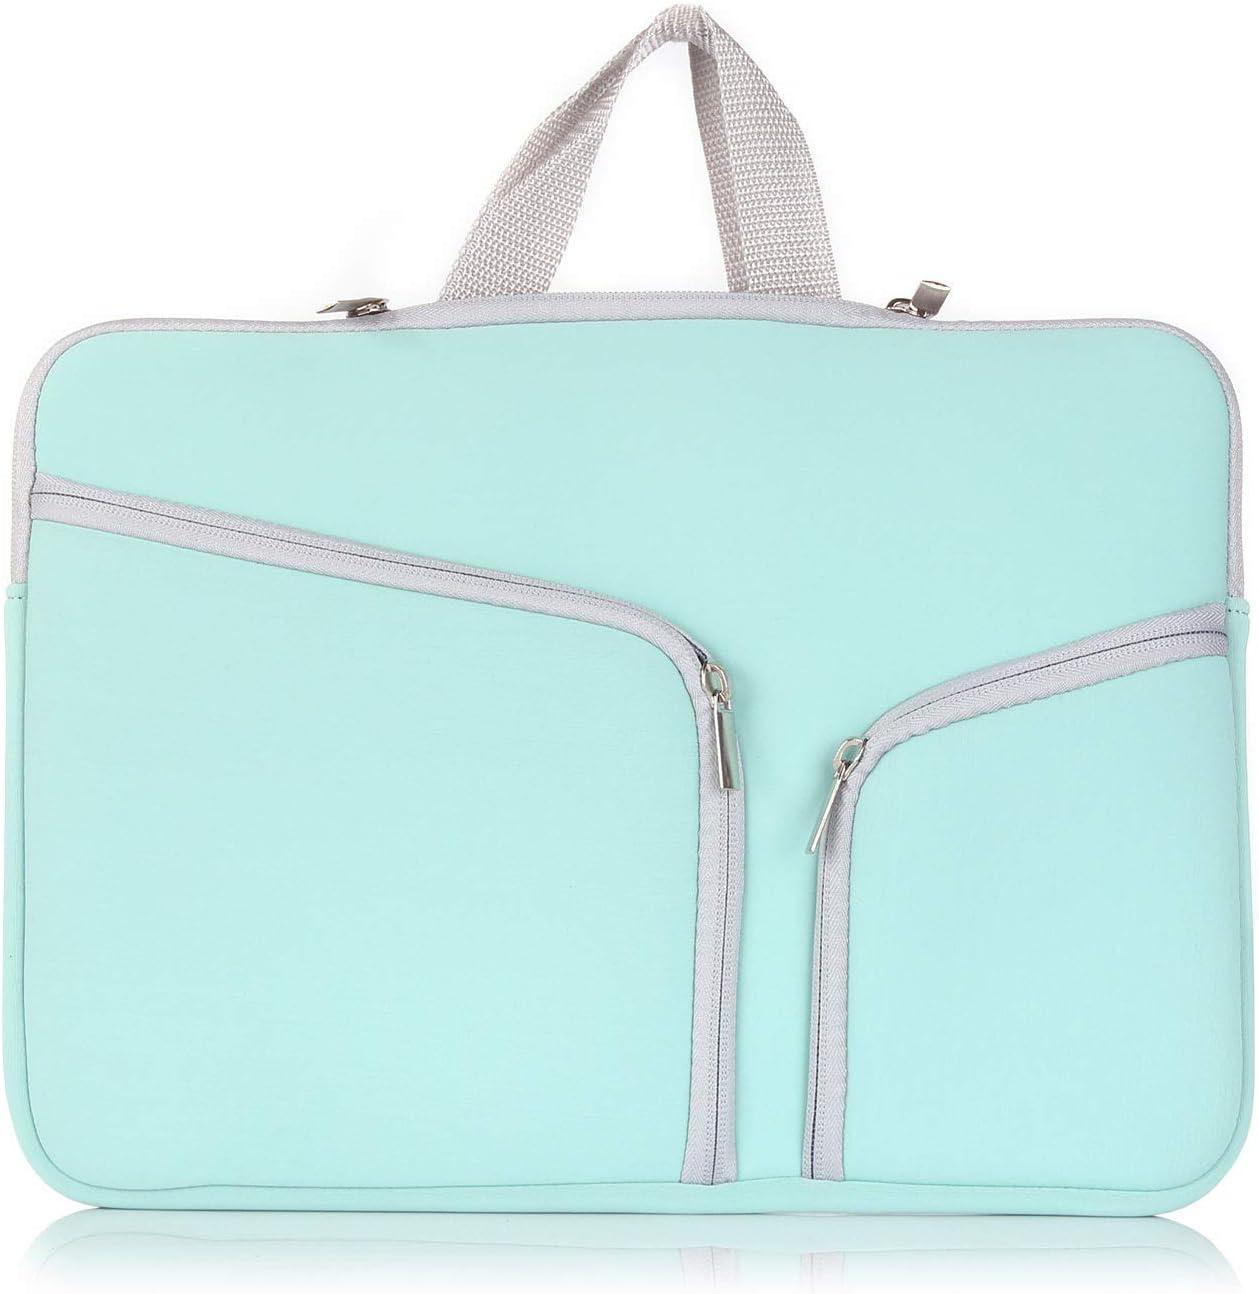 shop BREEZEY Max 68% OFF Universal Laptop Bag for MacBook 12'' Slee 11.6''